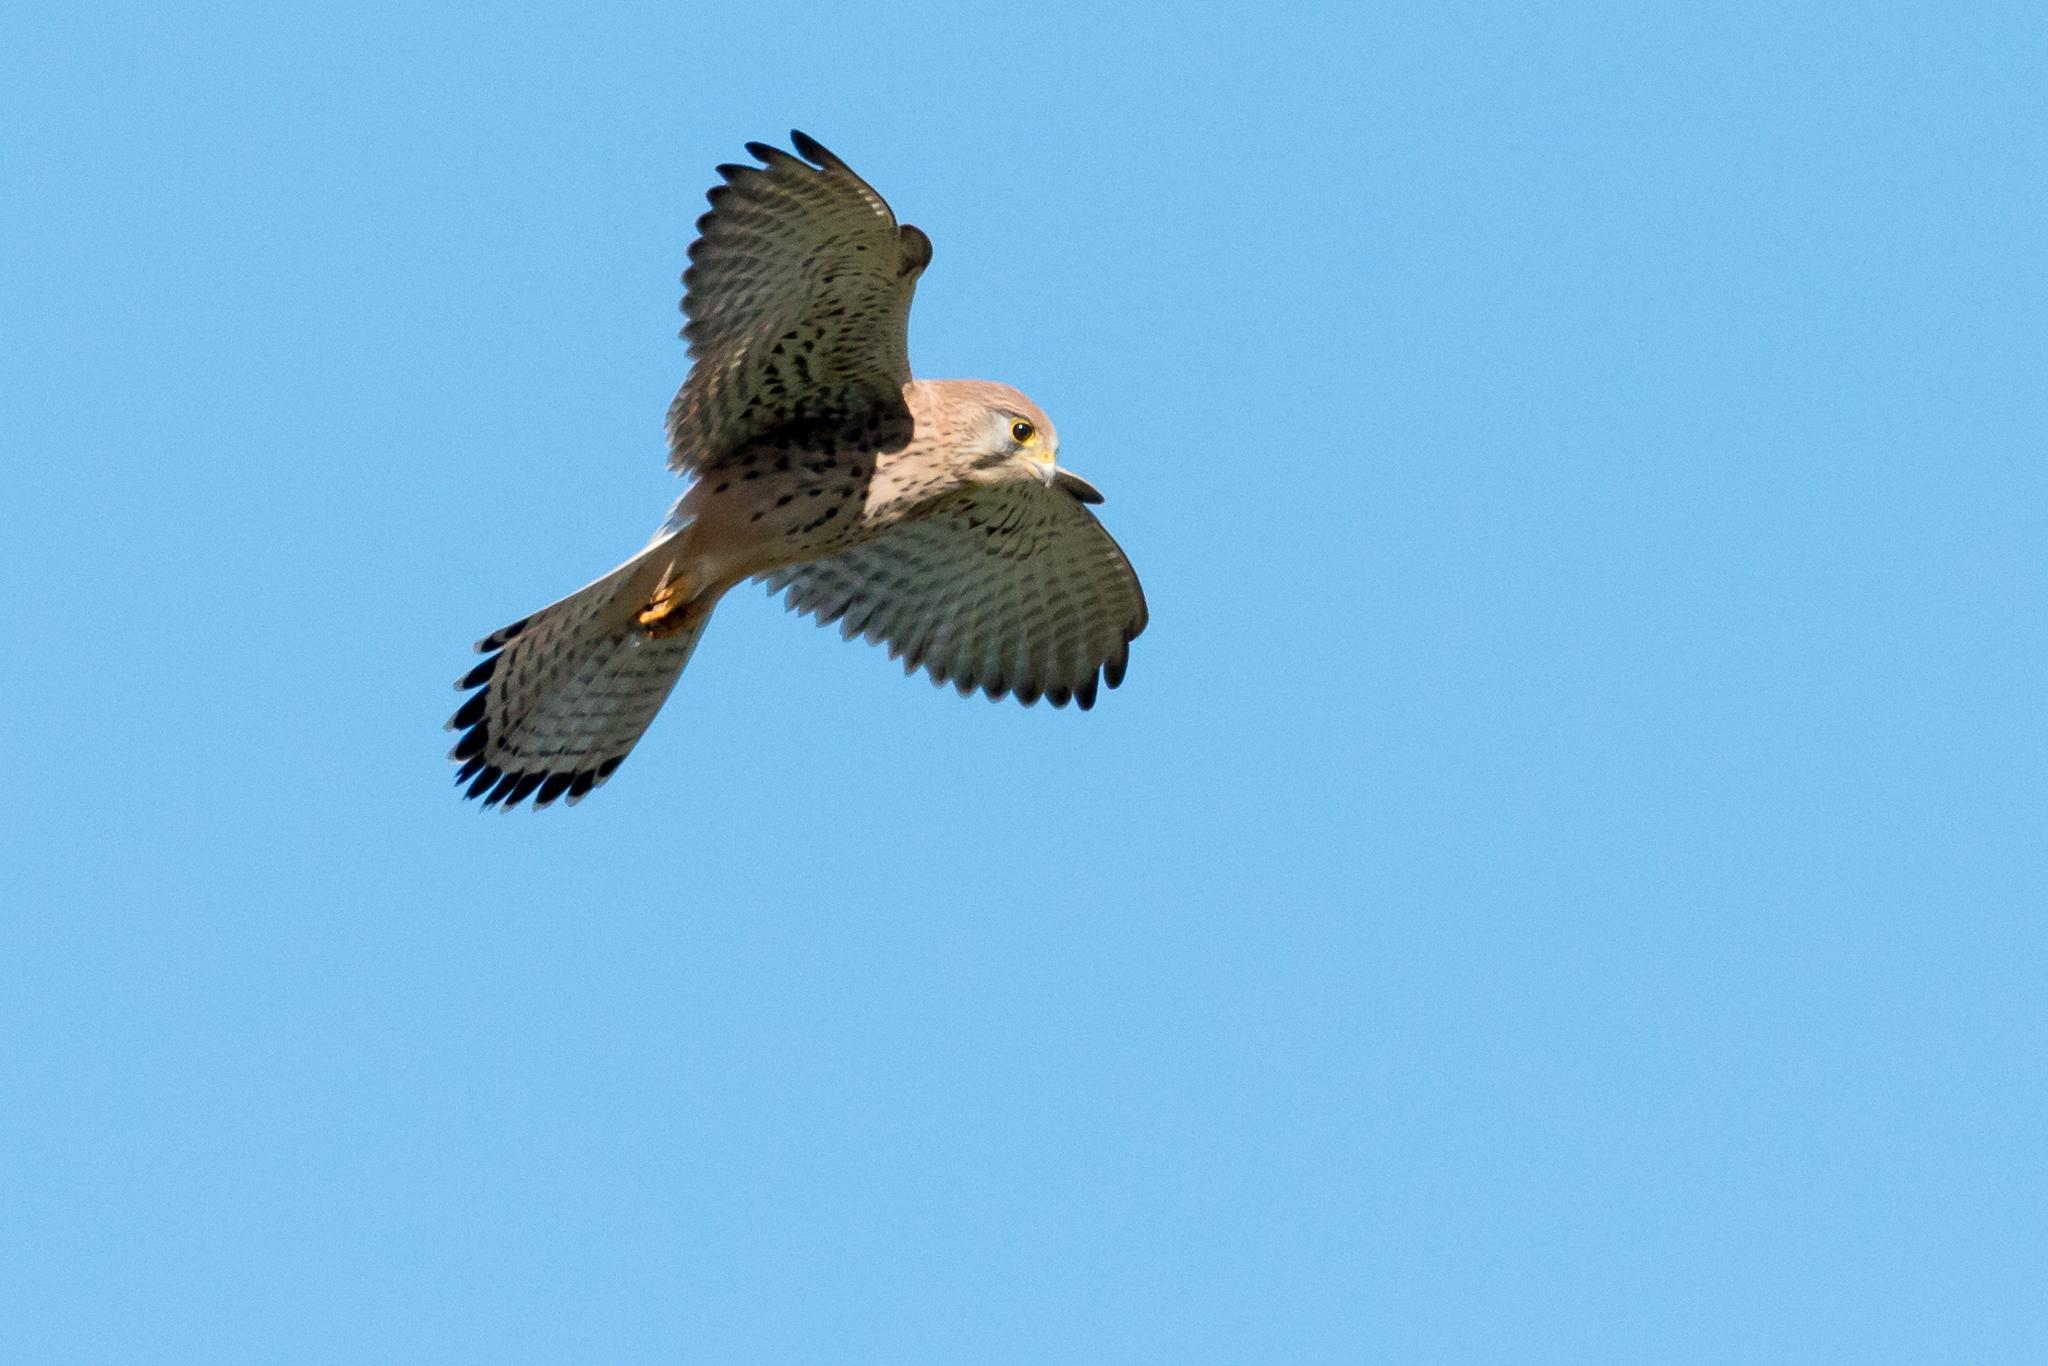 Faucon crécerelle (Falco tinnunculus) by FRA298